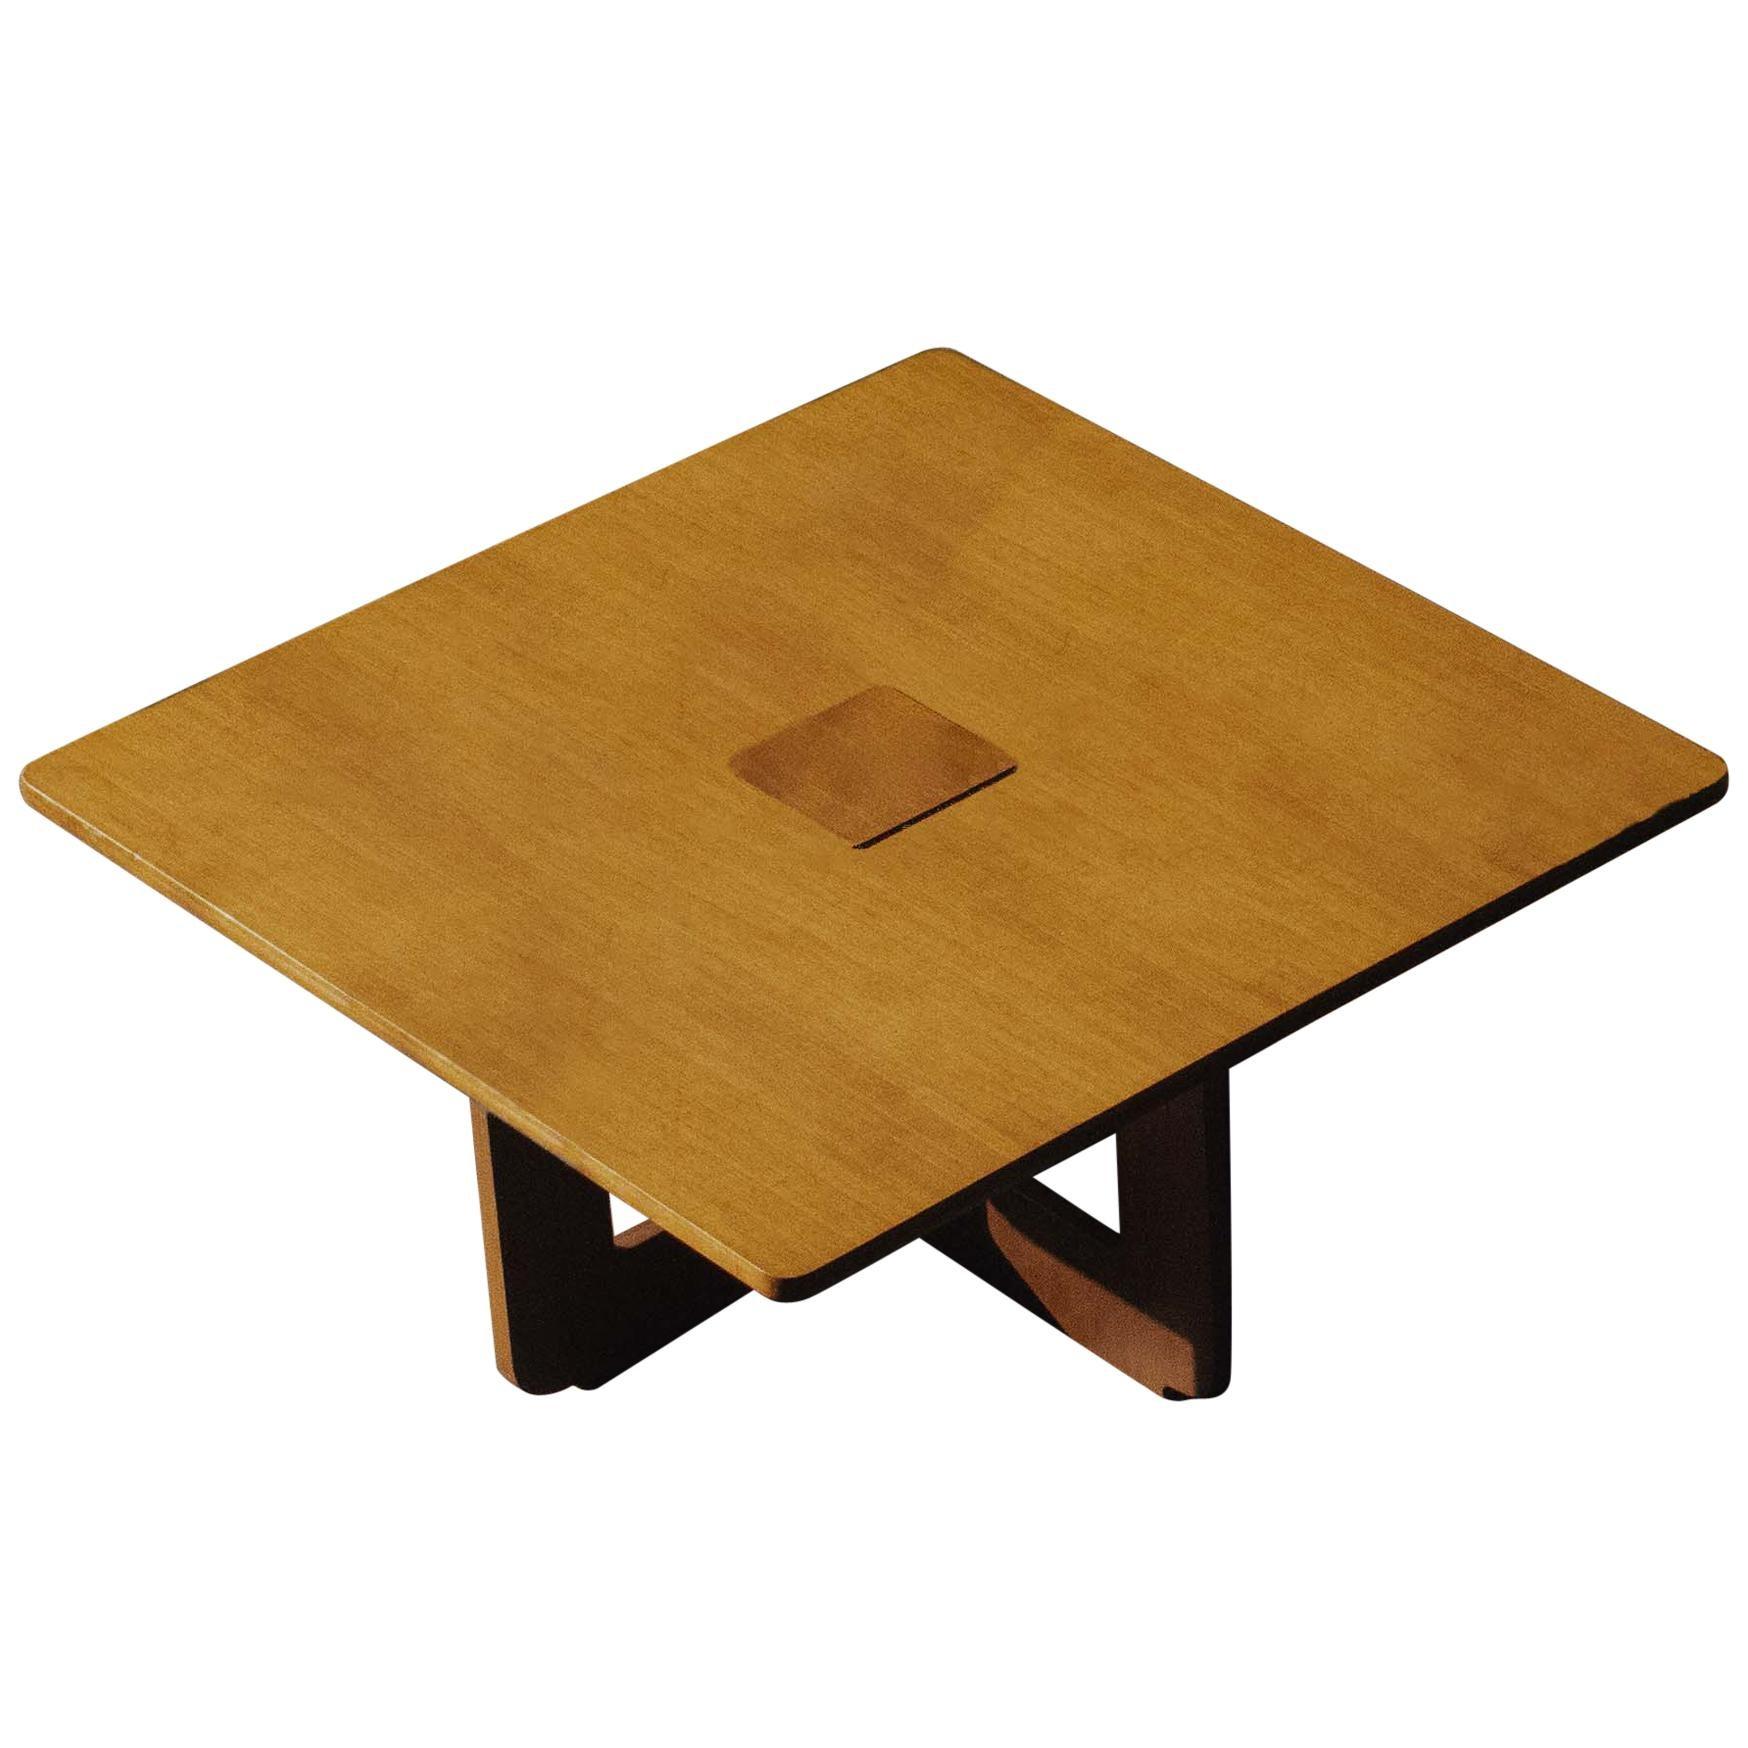 "Osvaldo Borsani ""T110"" Coffee Table for Tecno, 1962"